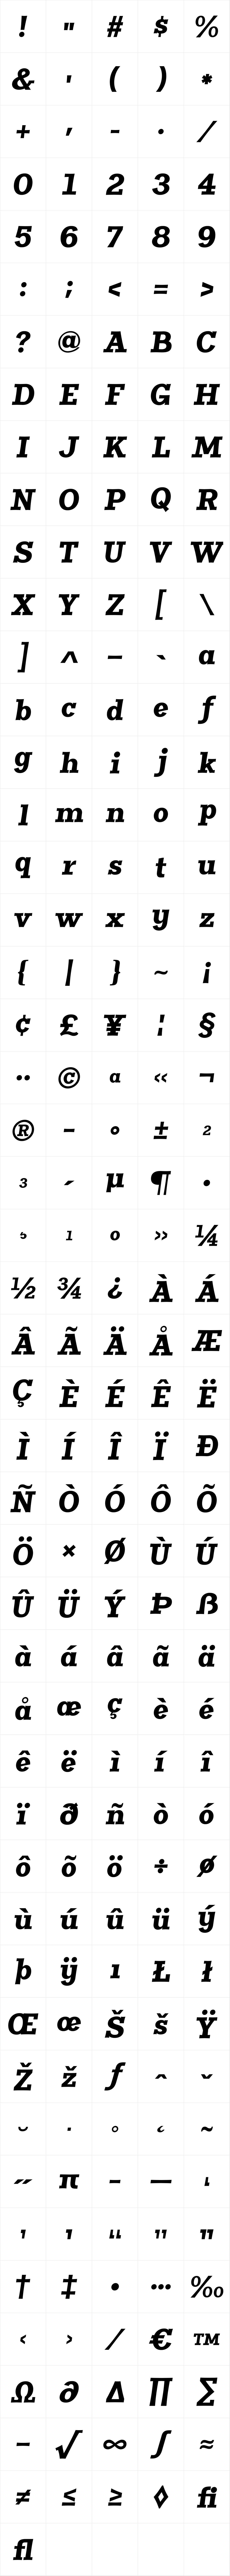 Clasica Slab UltraBlack Italic